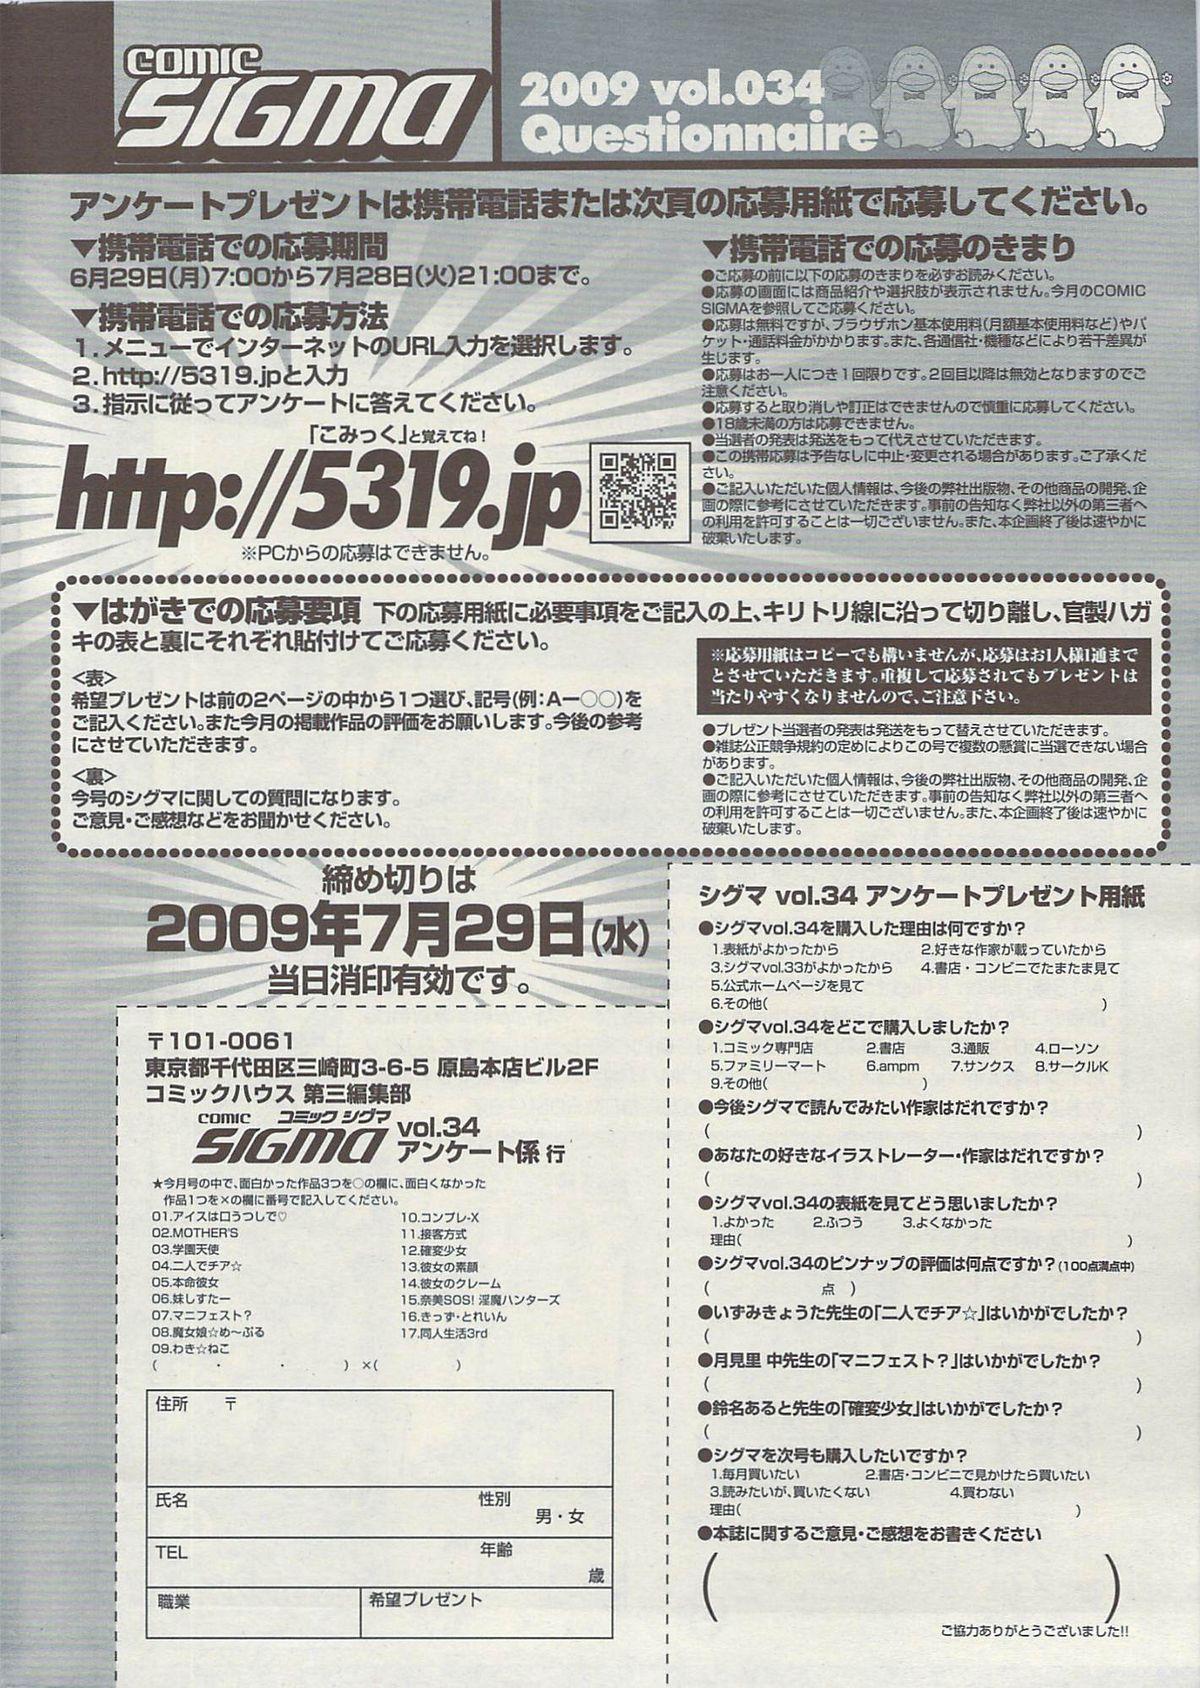 COMIC Sigma Vol.34 267